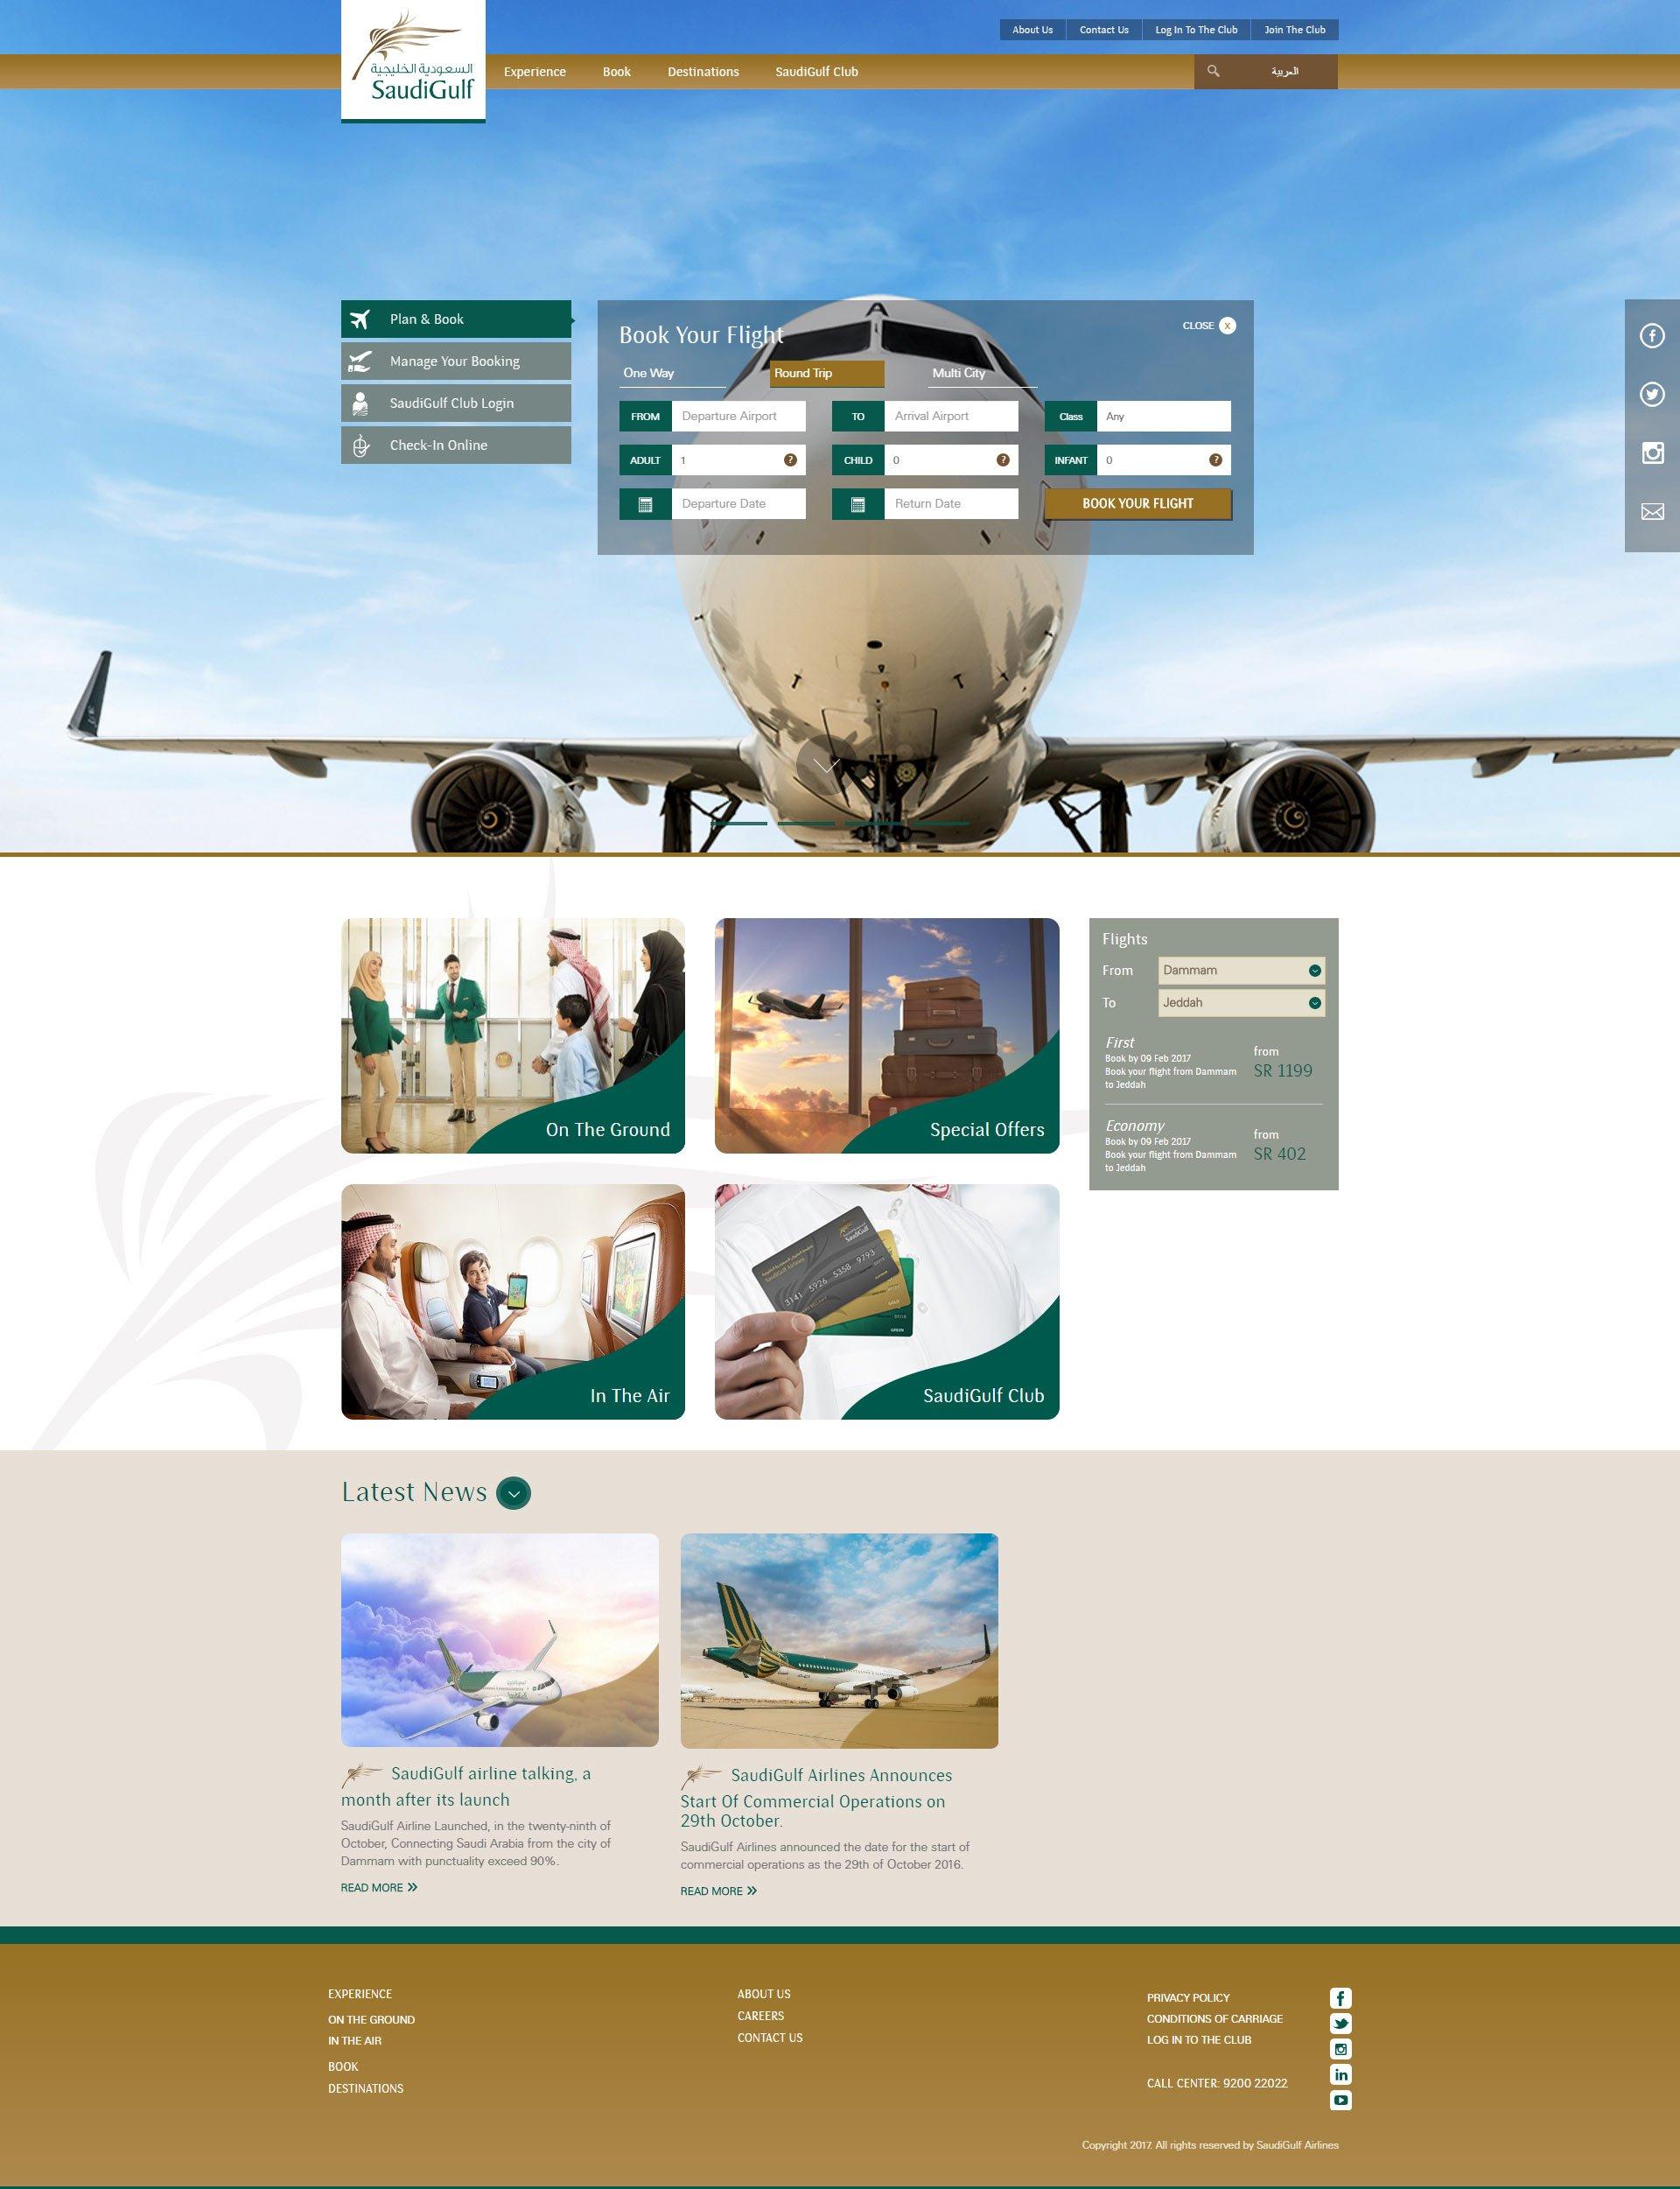 Portfolio - Saudi Gulf Airlines by Nexa Digital, Dubai, UAE